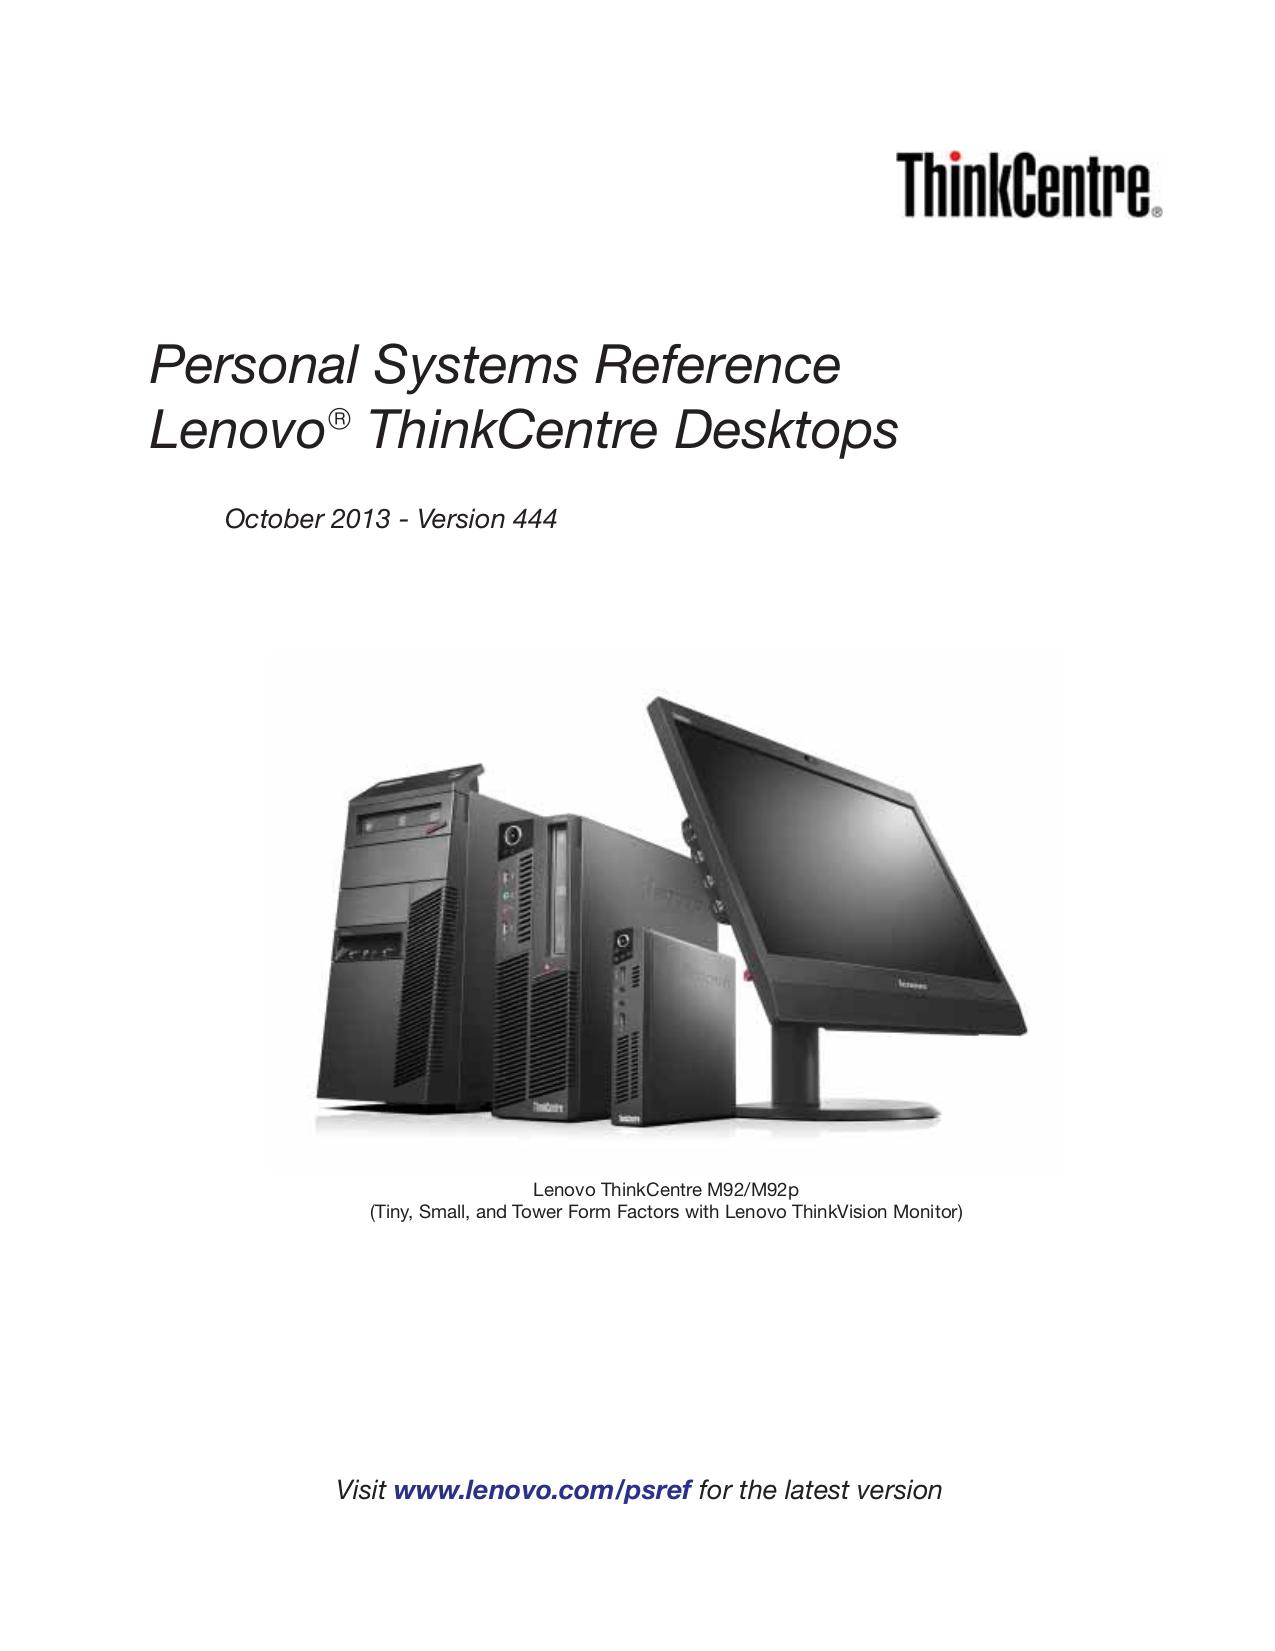 pdf for Lenovo Desktop ThinkCentre M58p 6138 manual